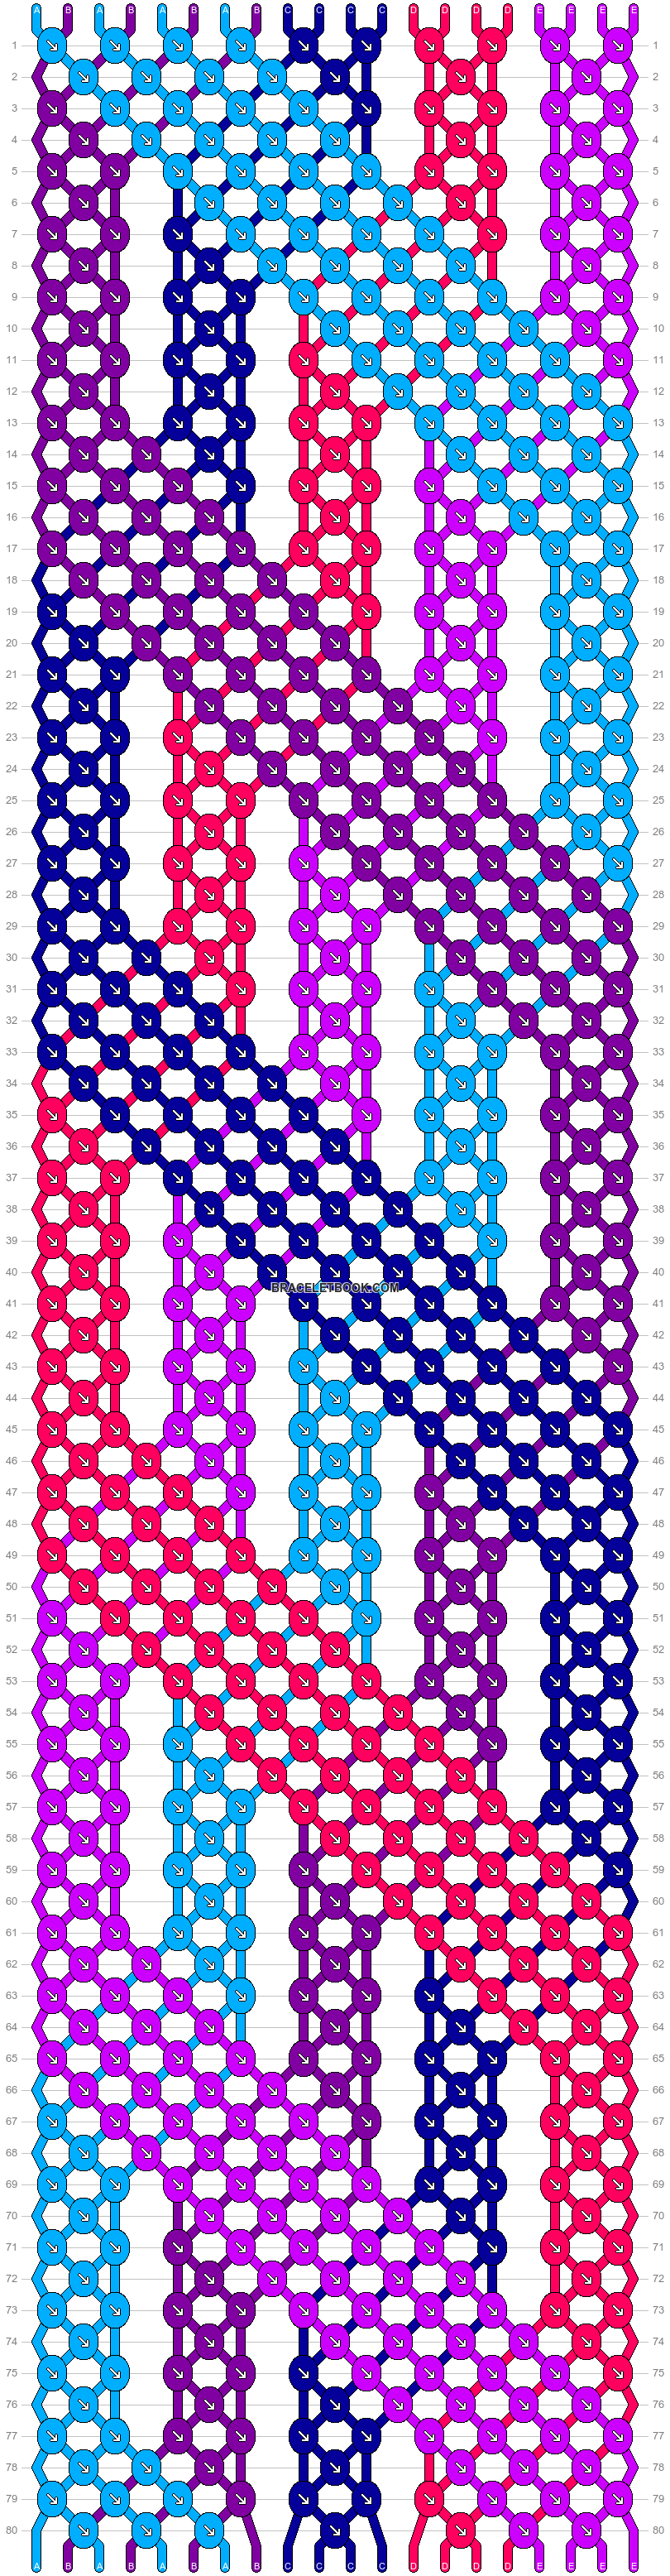 Normal Pattern #22611 added by CWillard